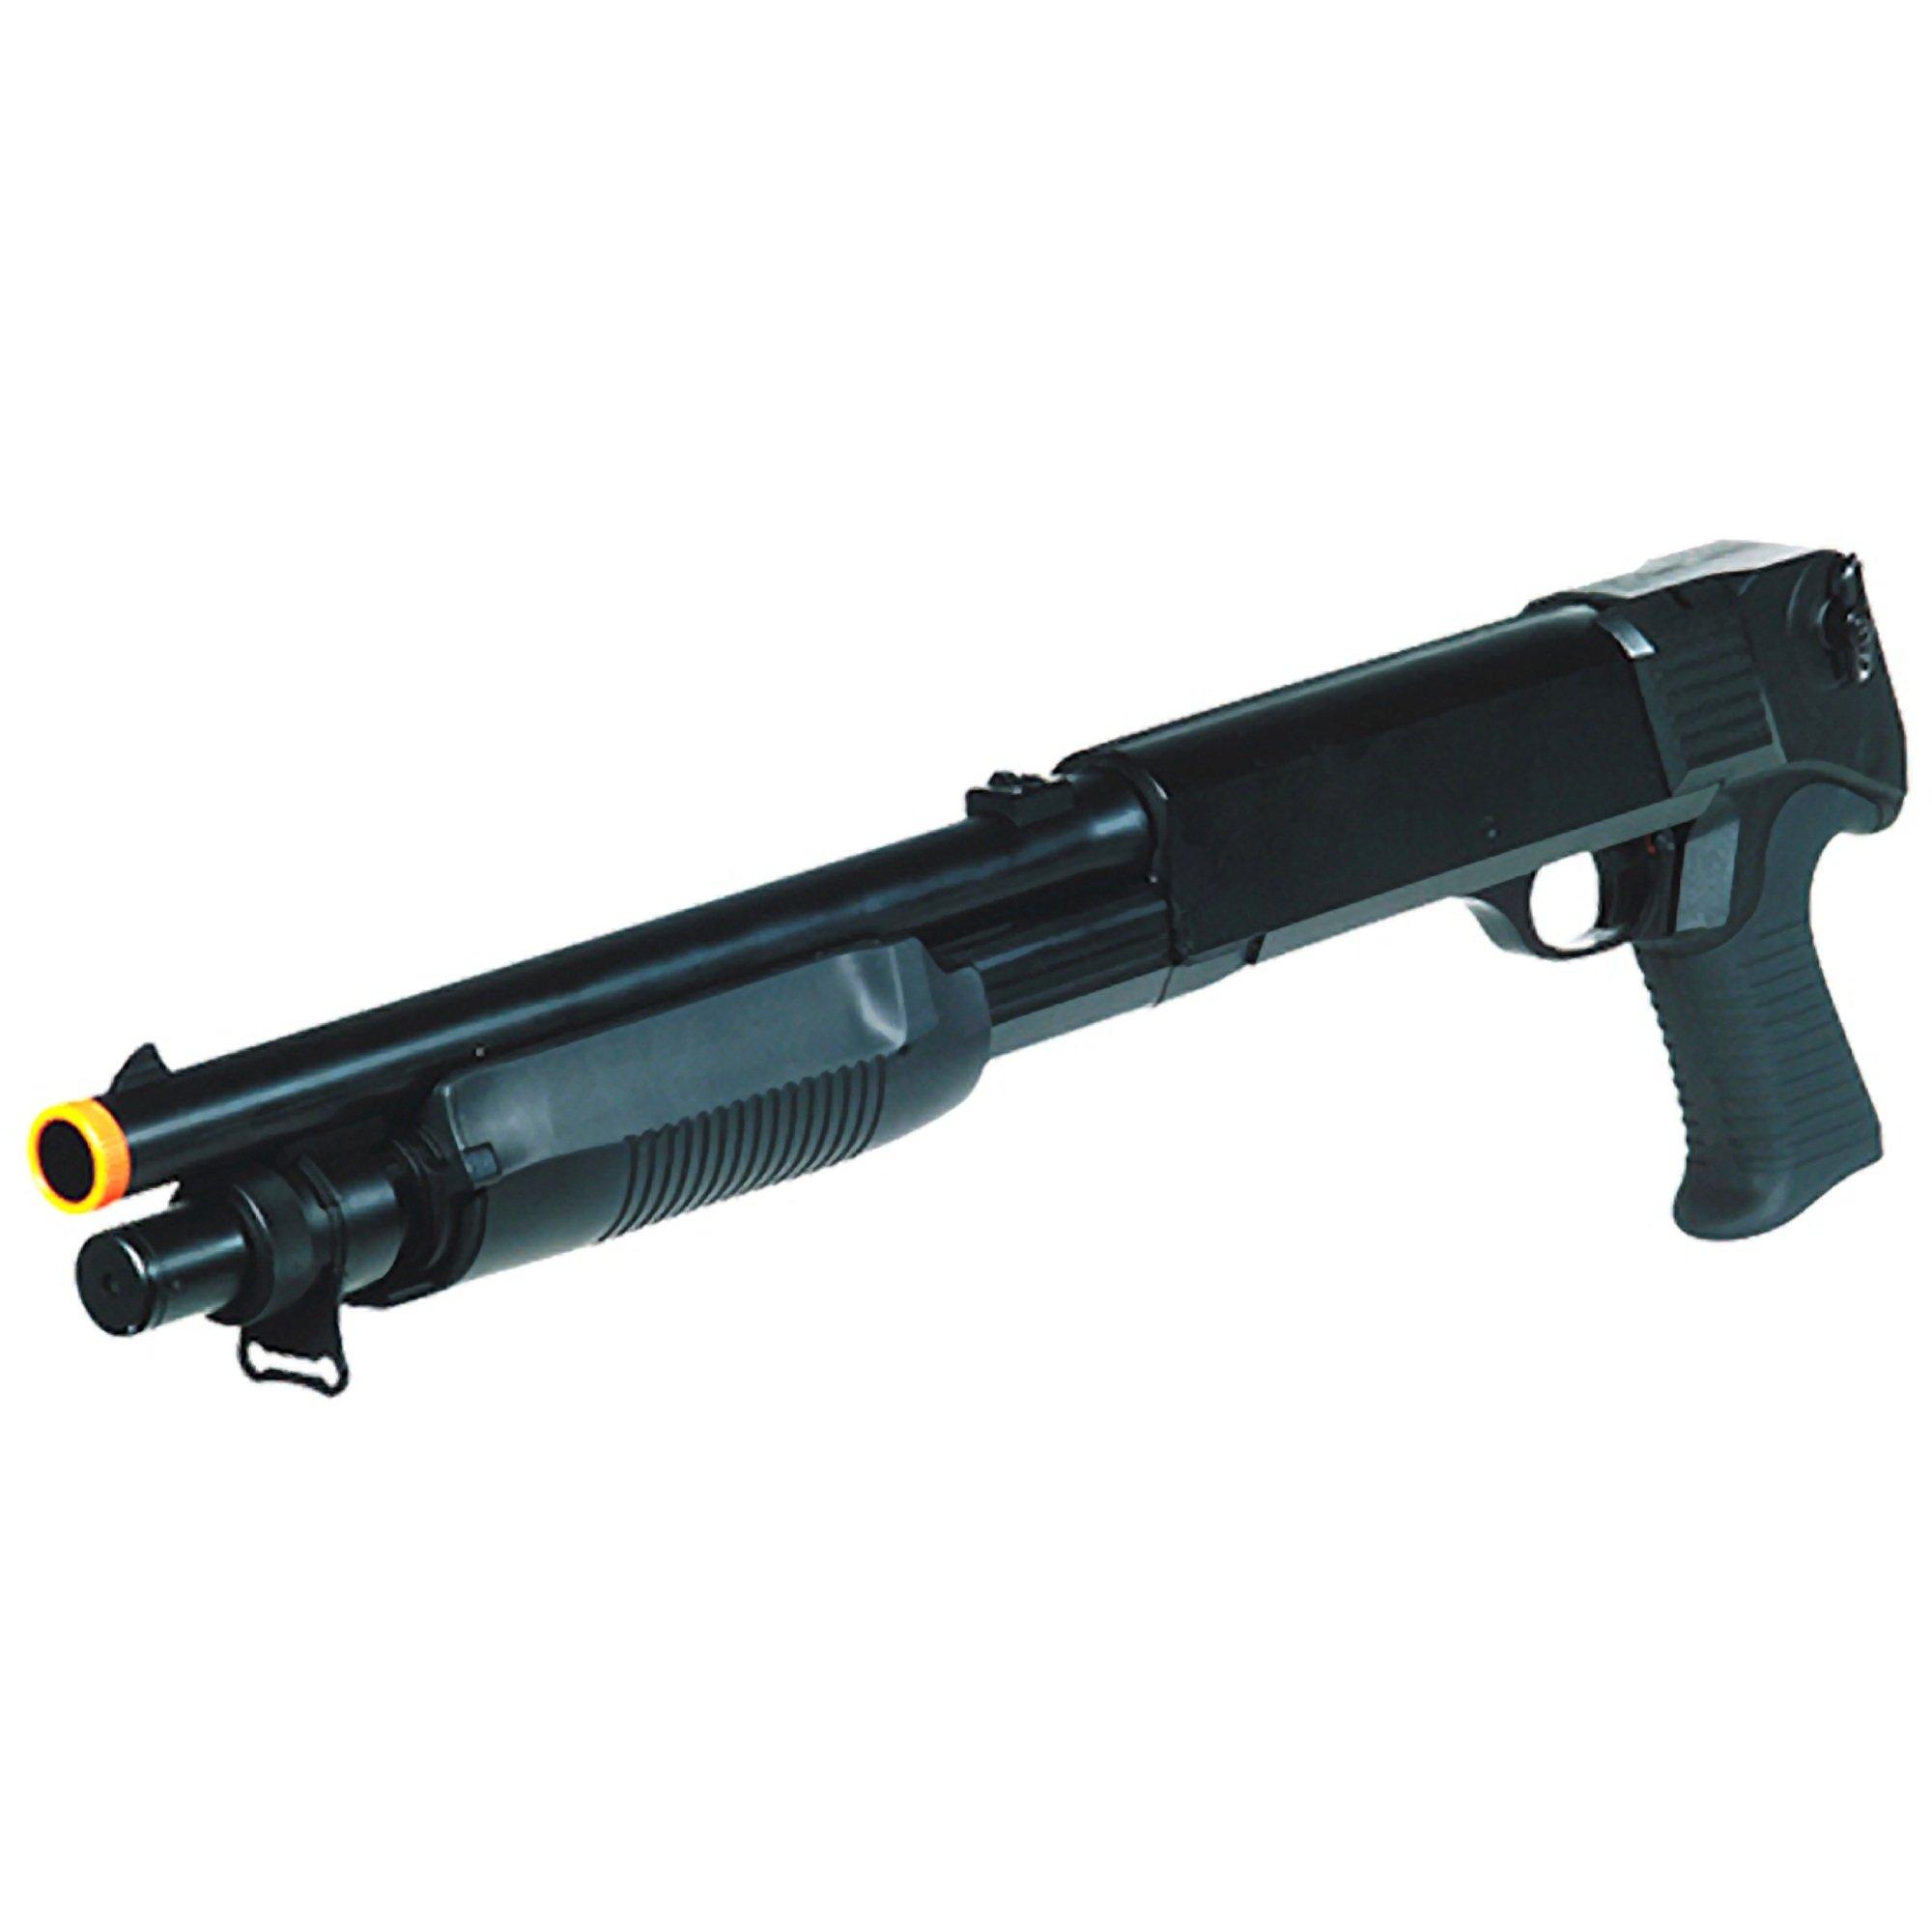 Multi-Shot Combat Commando Shotgun airsoft gun by UTG